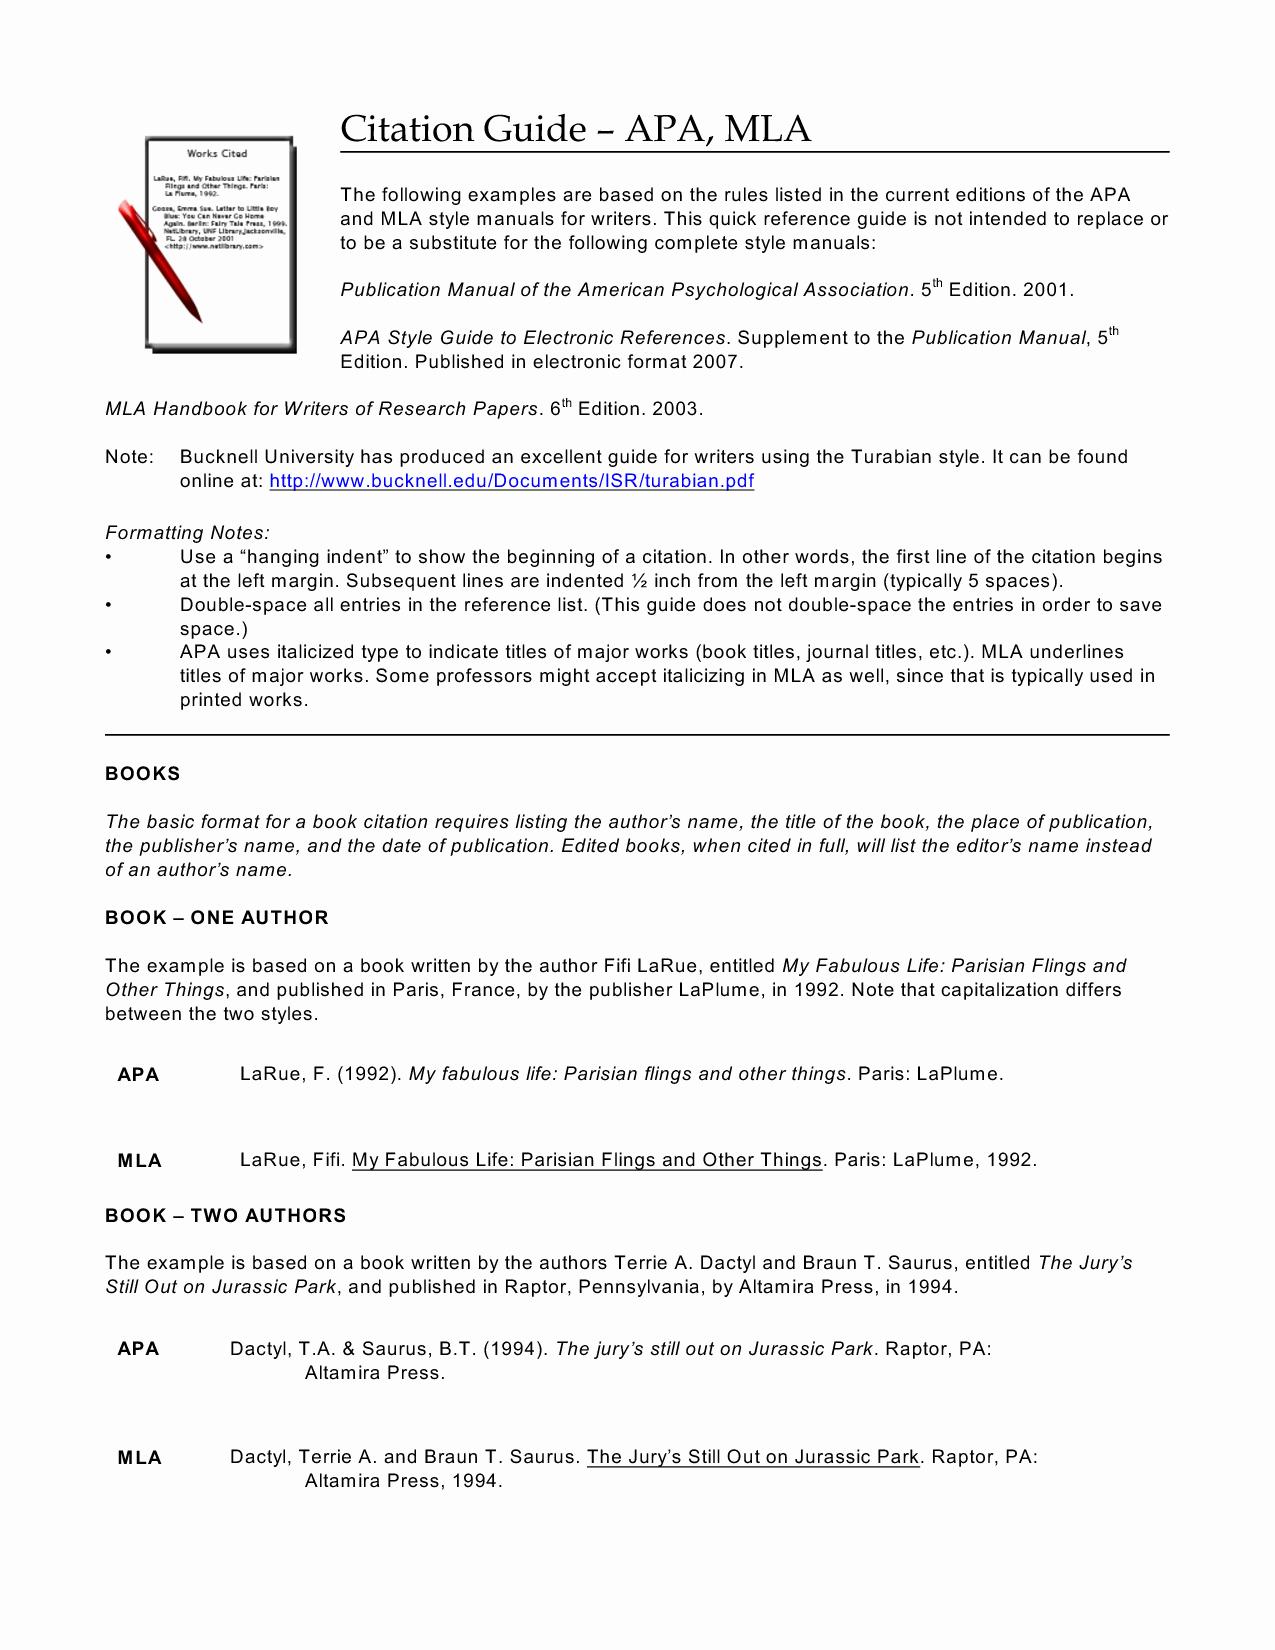 50 Mla Citation Practice Worksheet